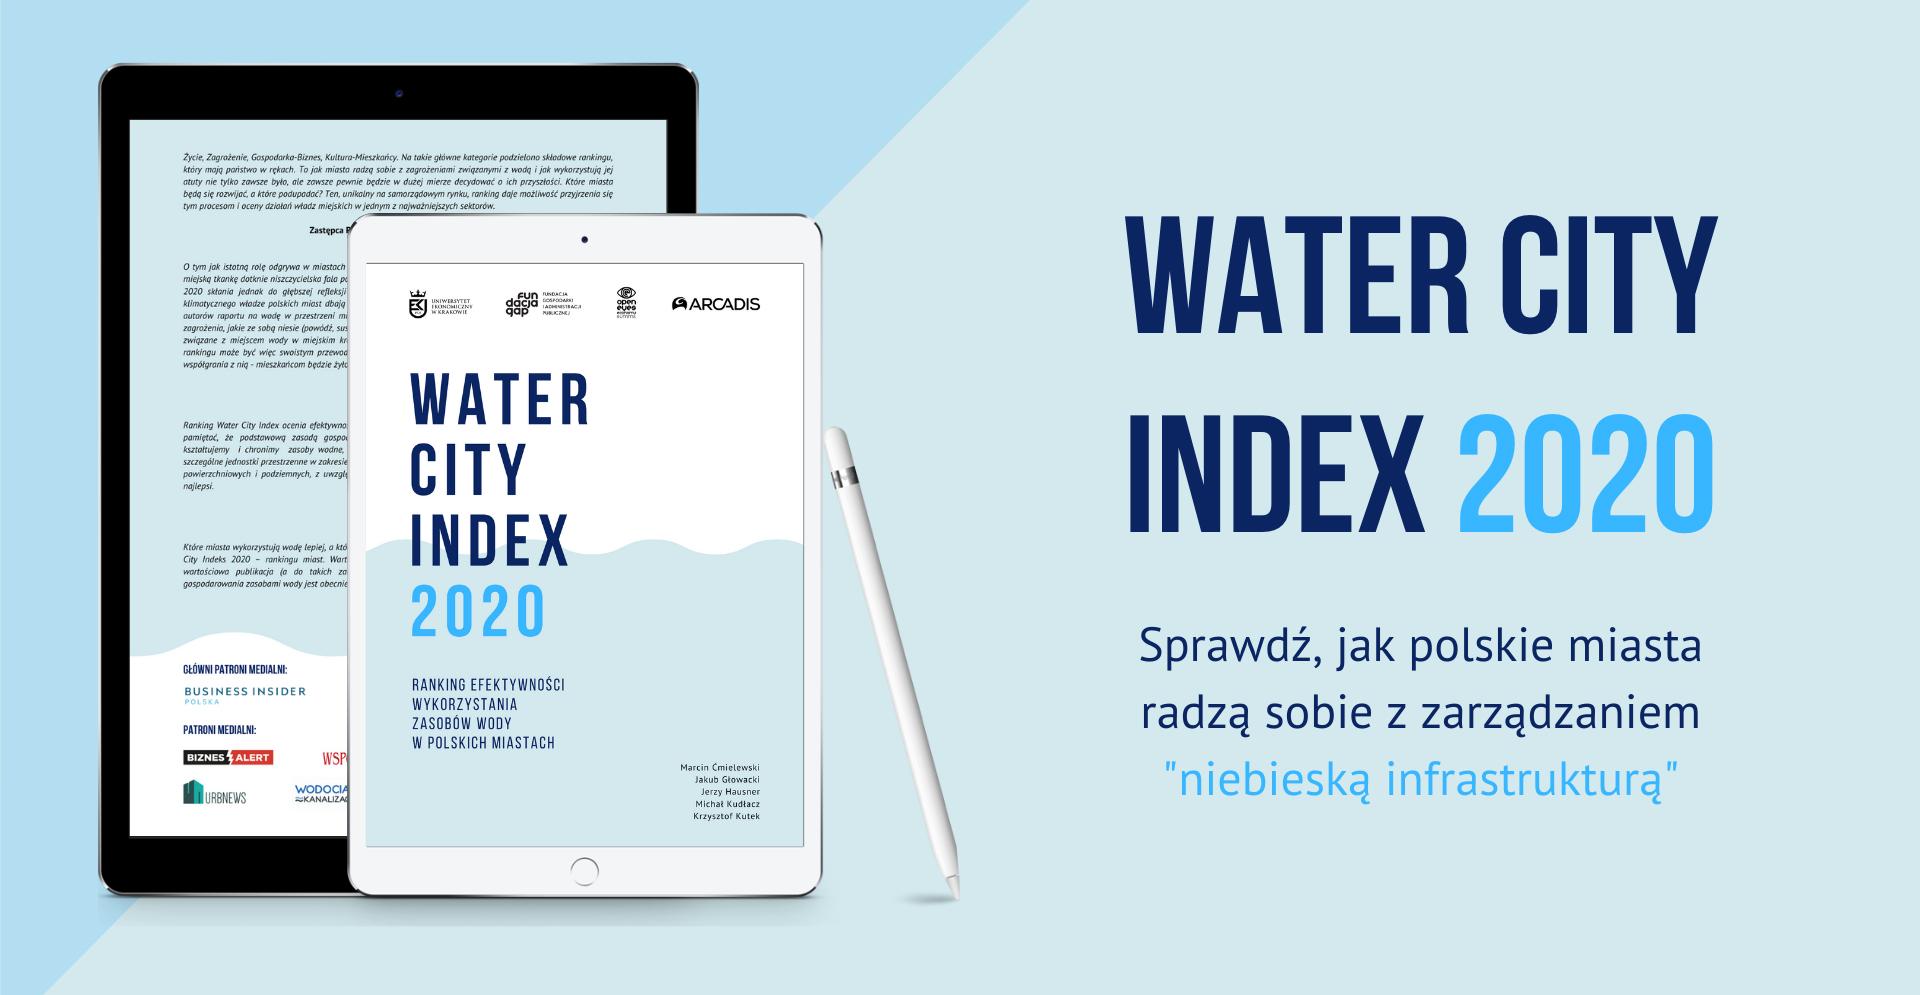 WATER CITY INDEX 2020